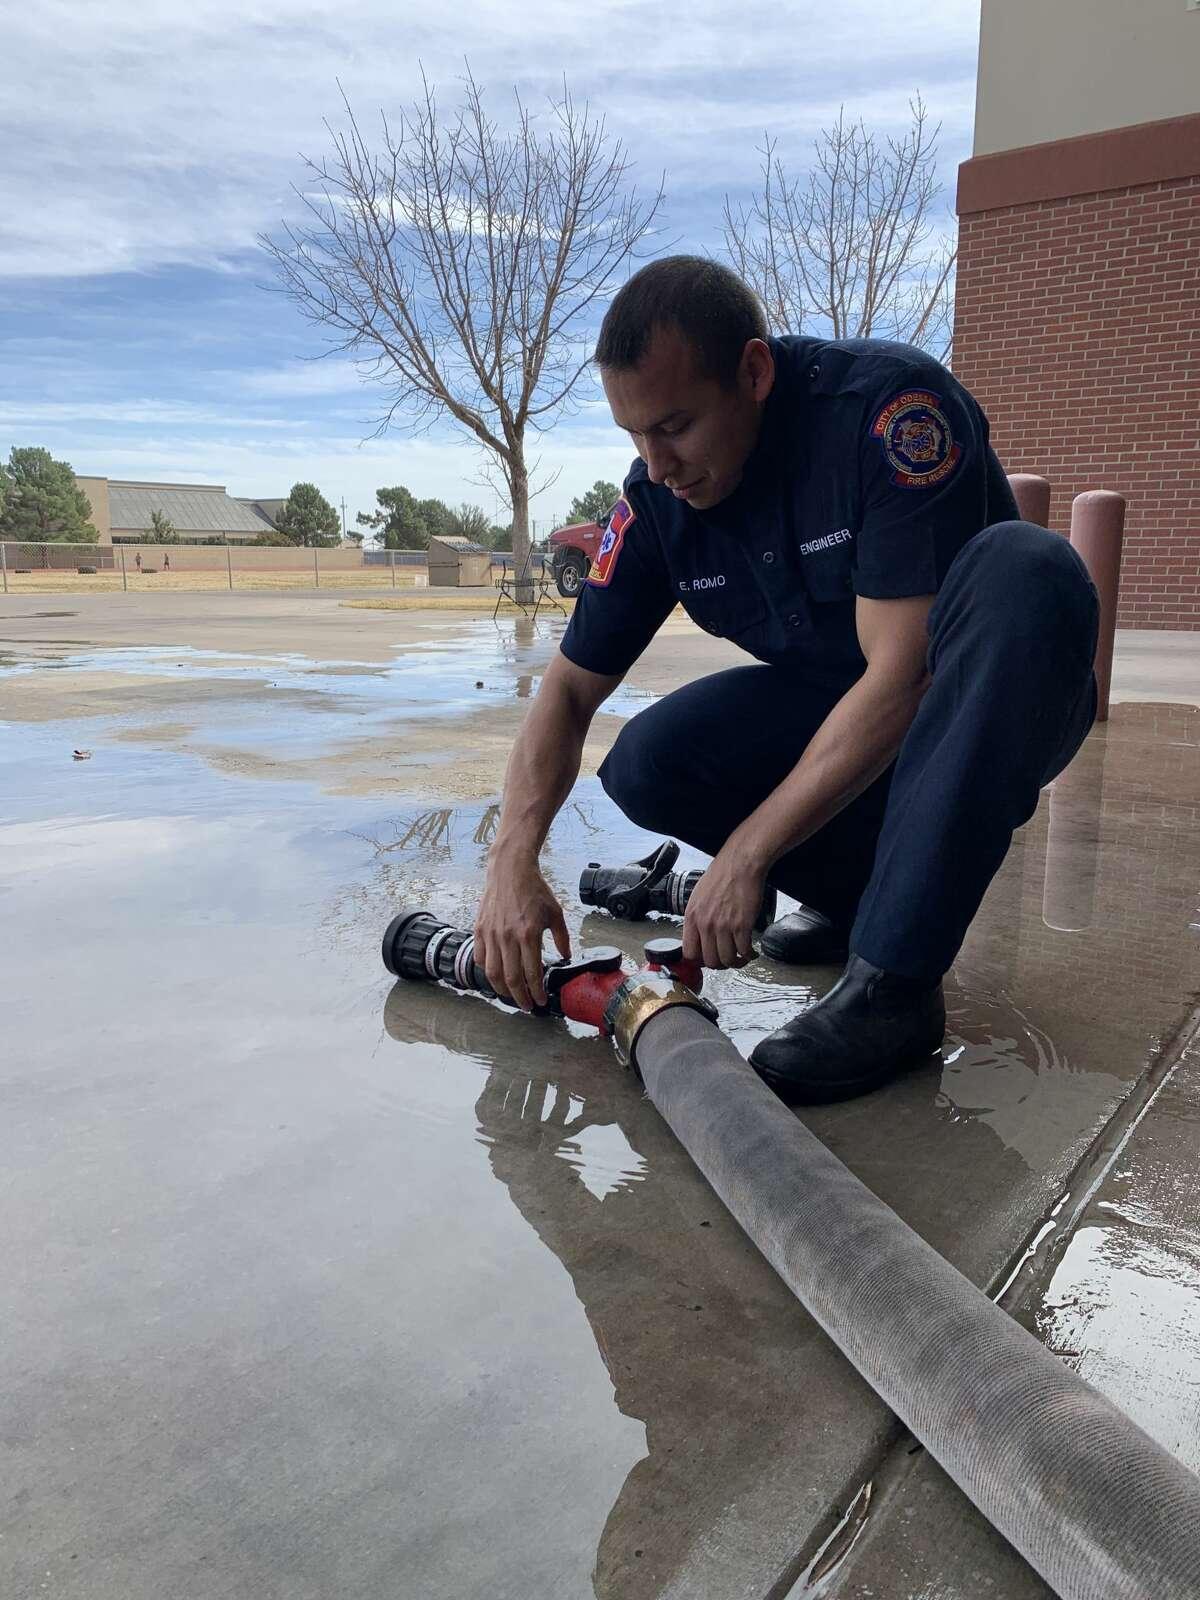 Clarke's fiancé on firefighter duty.